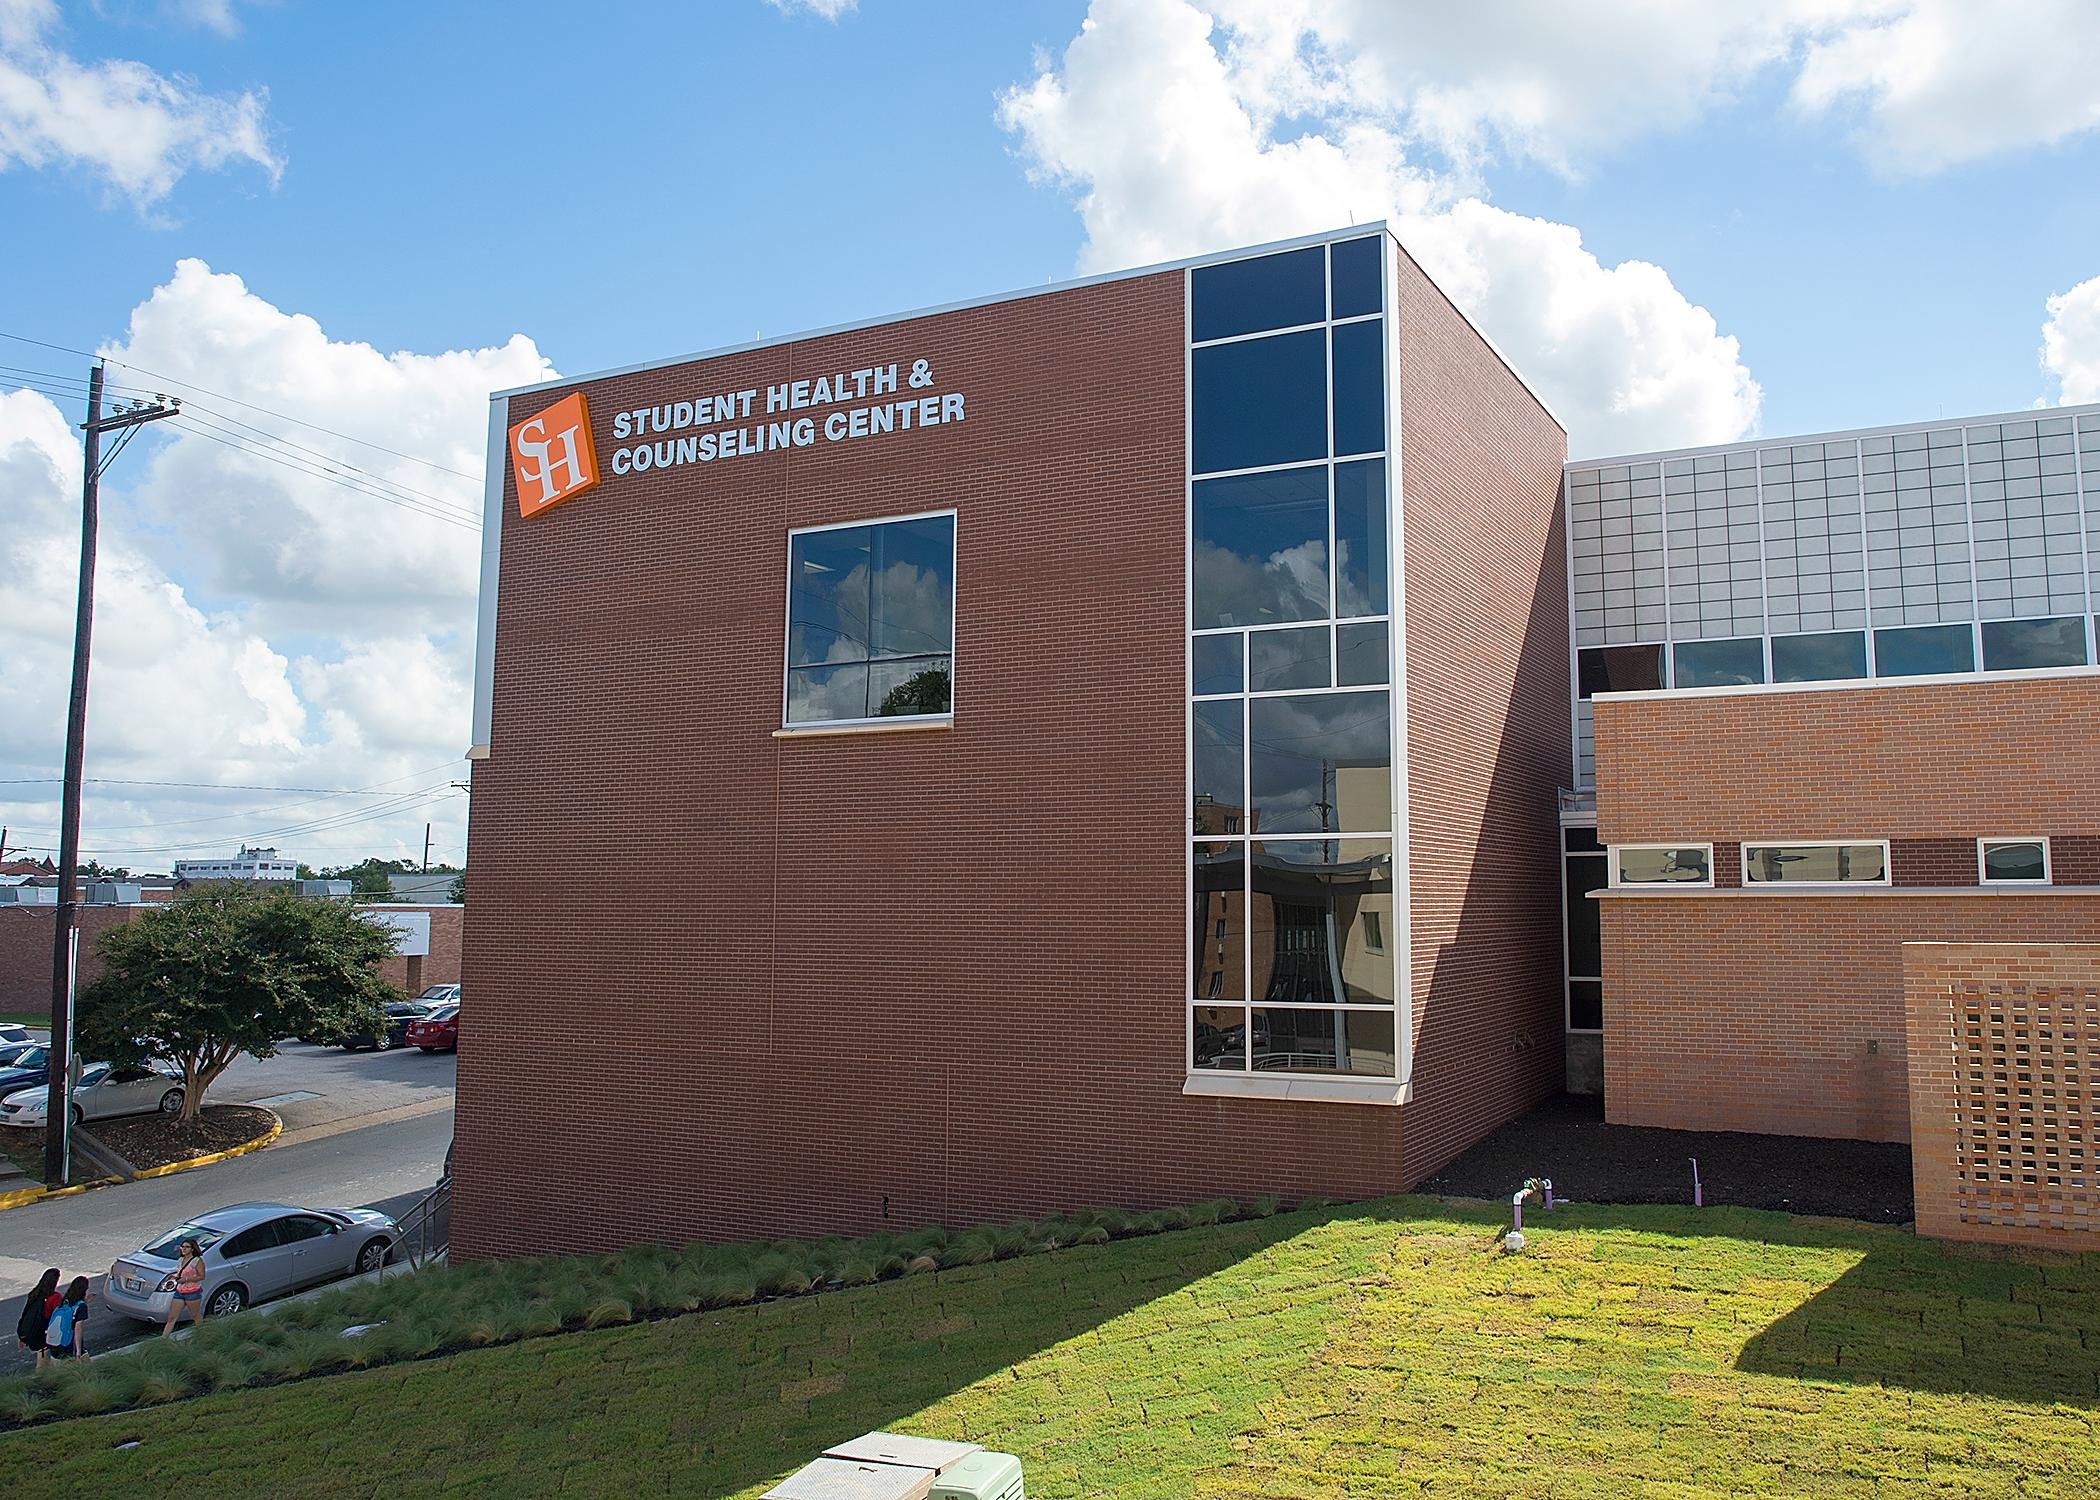 SHSU Student Health Center